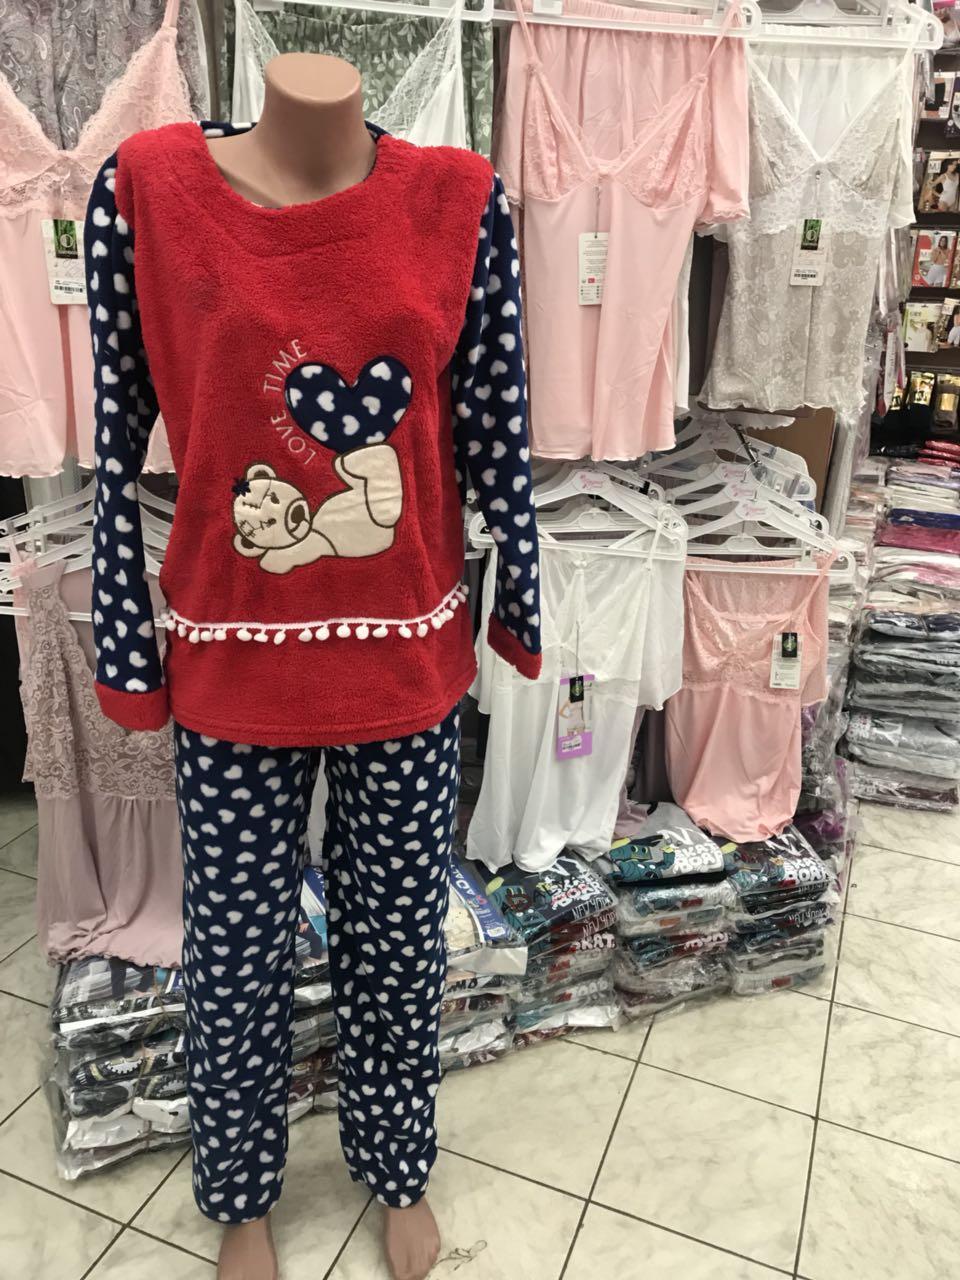 4d8a15a6ae0b Турецкая махровая женская пижама,Турция, размеры от 40 до 54 -  Интернет-магазин